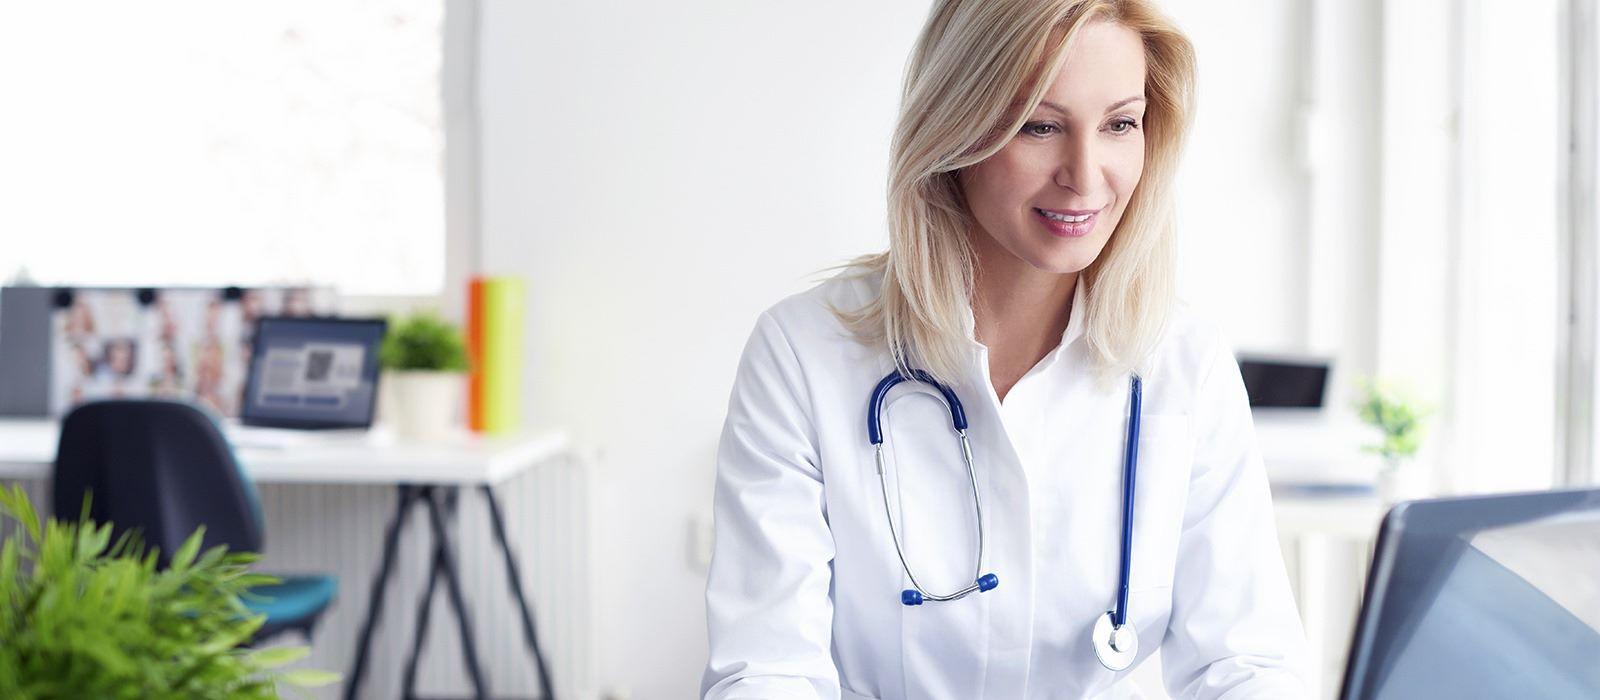 fortbildung-medizin